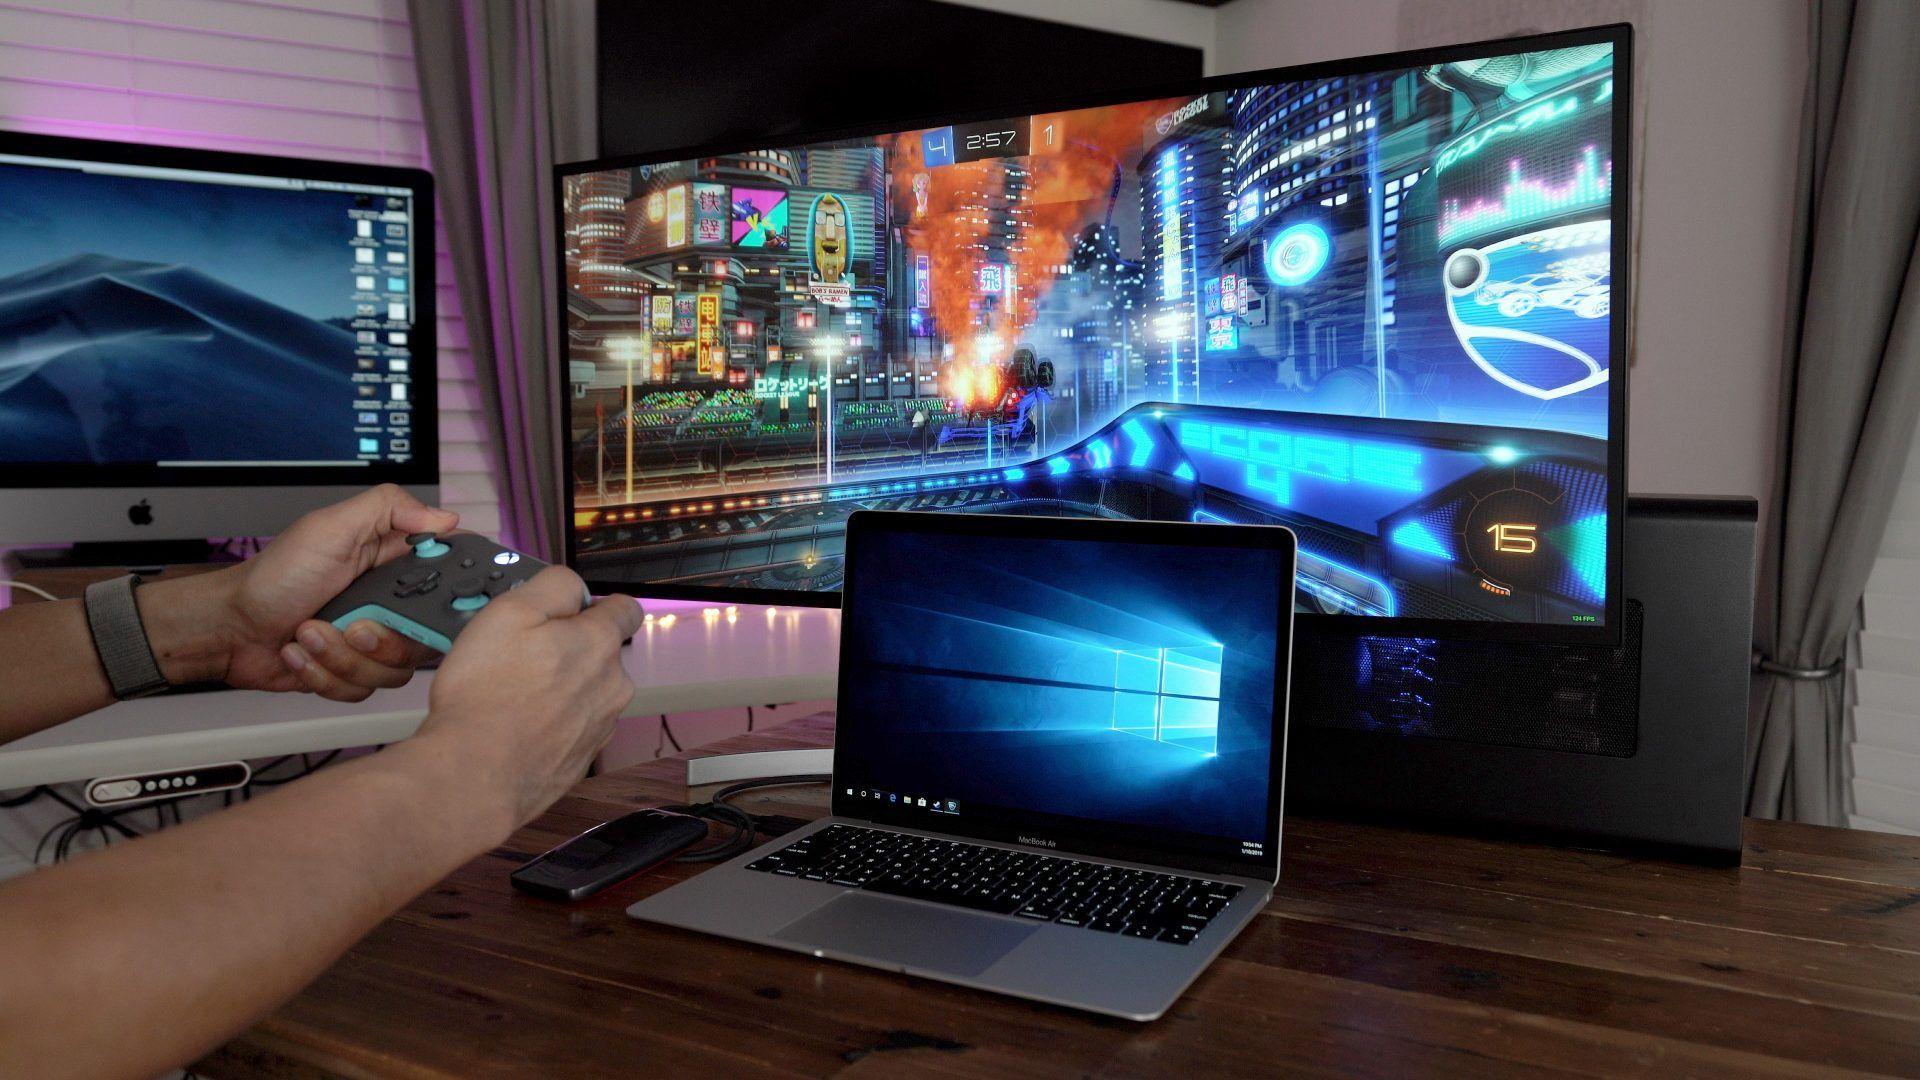 How To Macbook Air Windows 10 Rtx 2080 Egpu Gaming Setup Video Macbook Gaming Setup Macbook Air